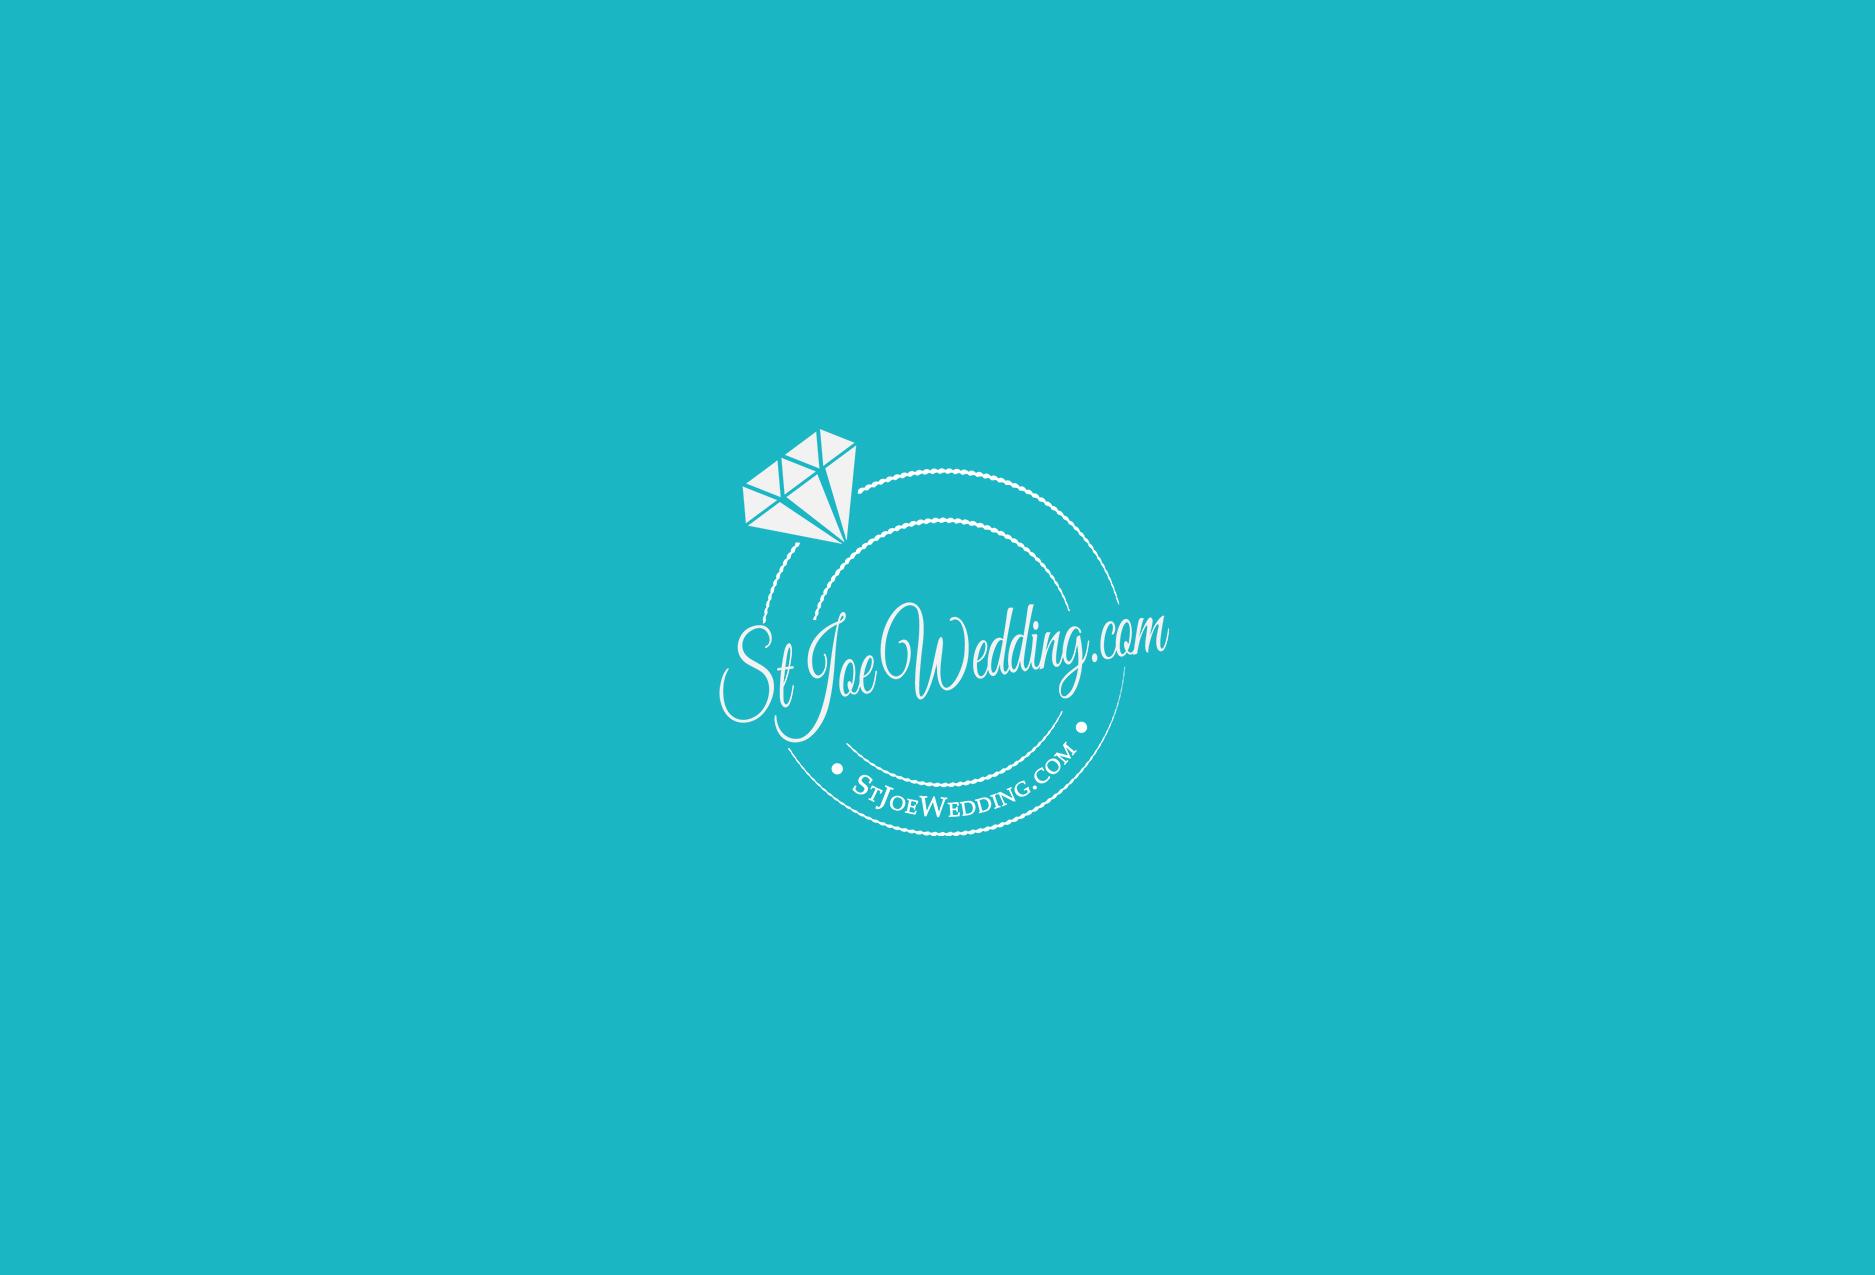 SJW Invite - back